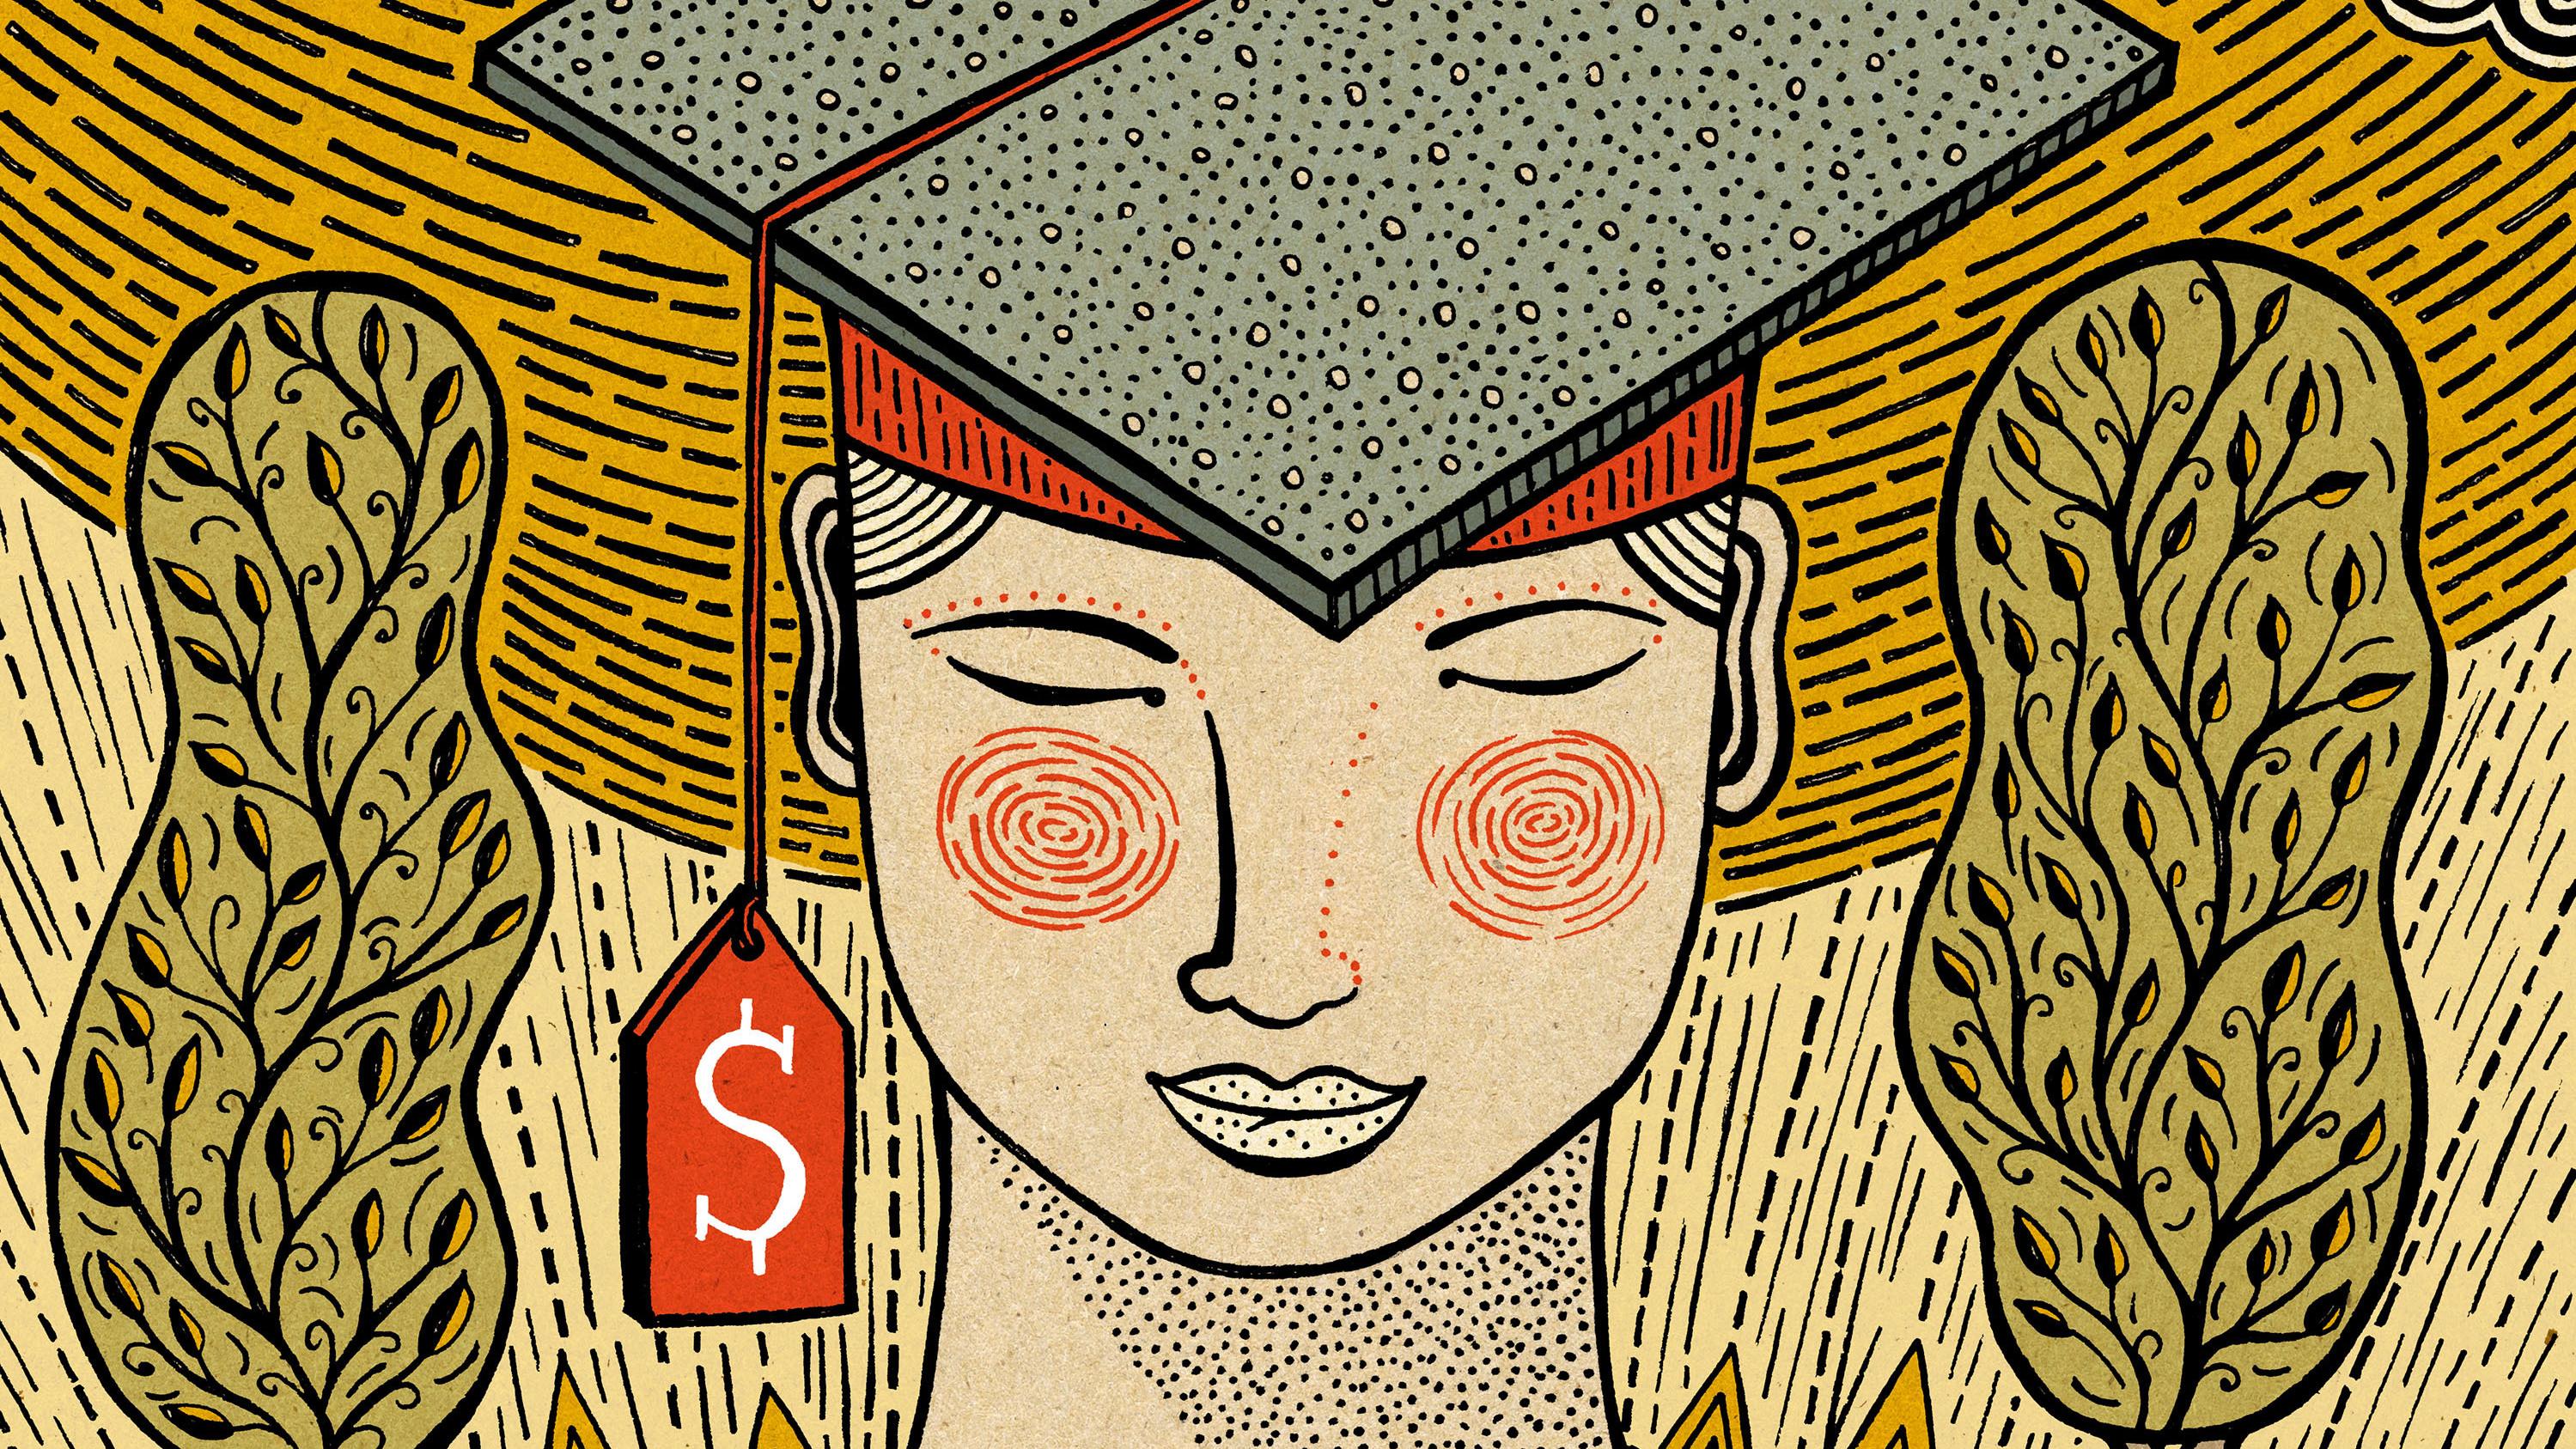 sociology dissertations boston college